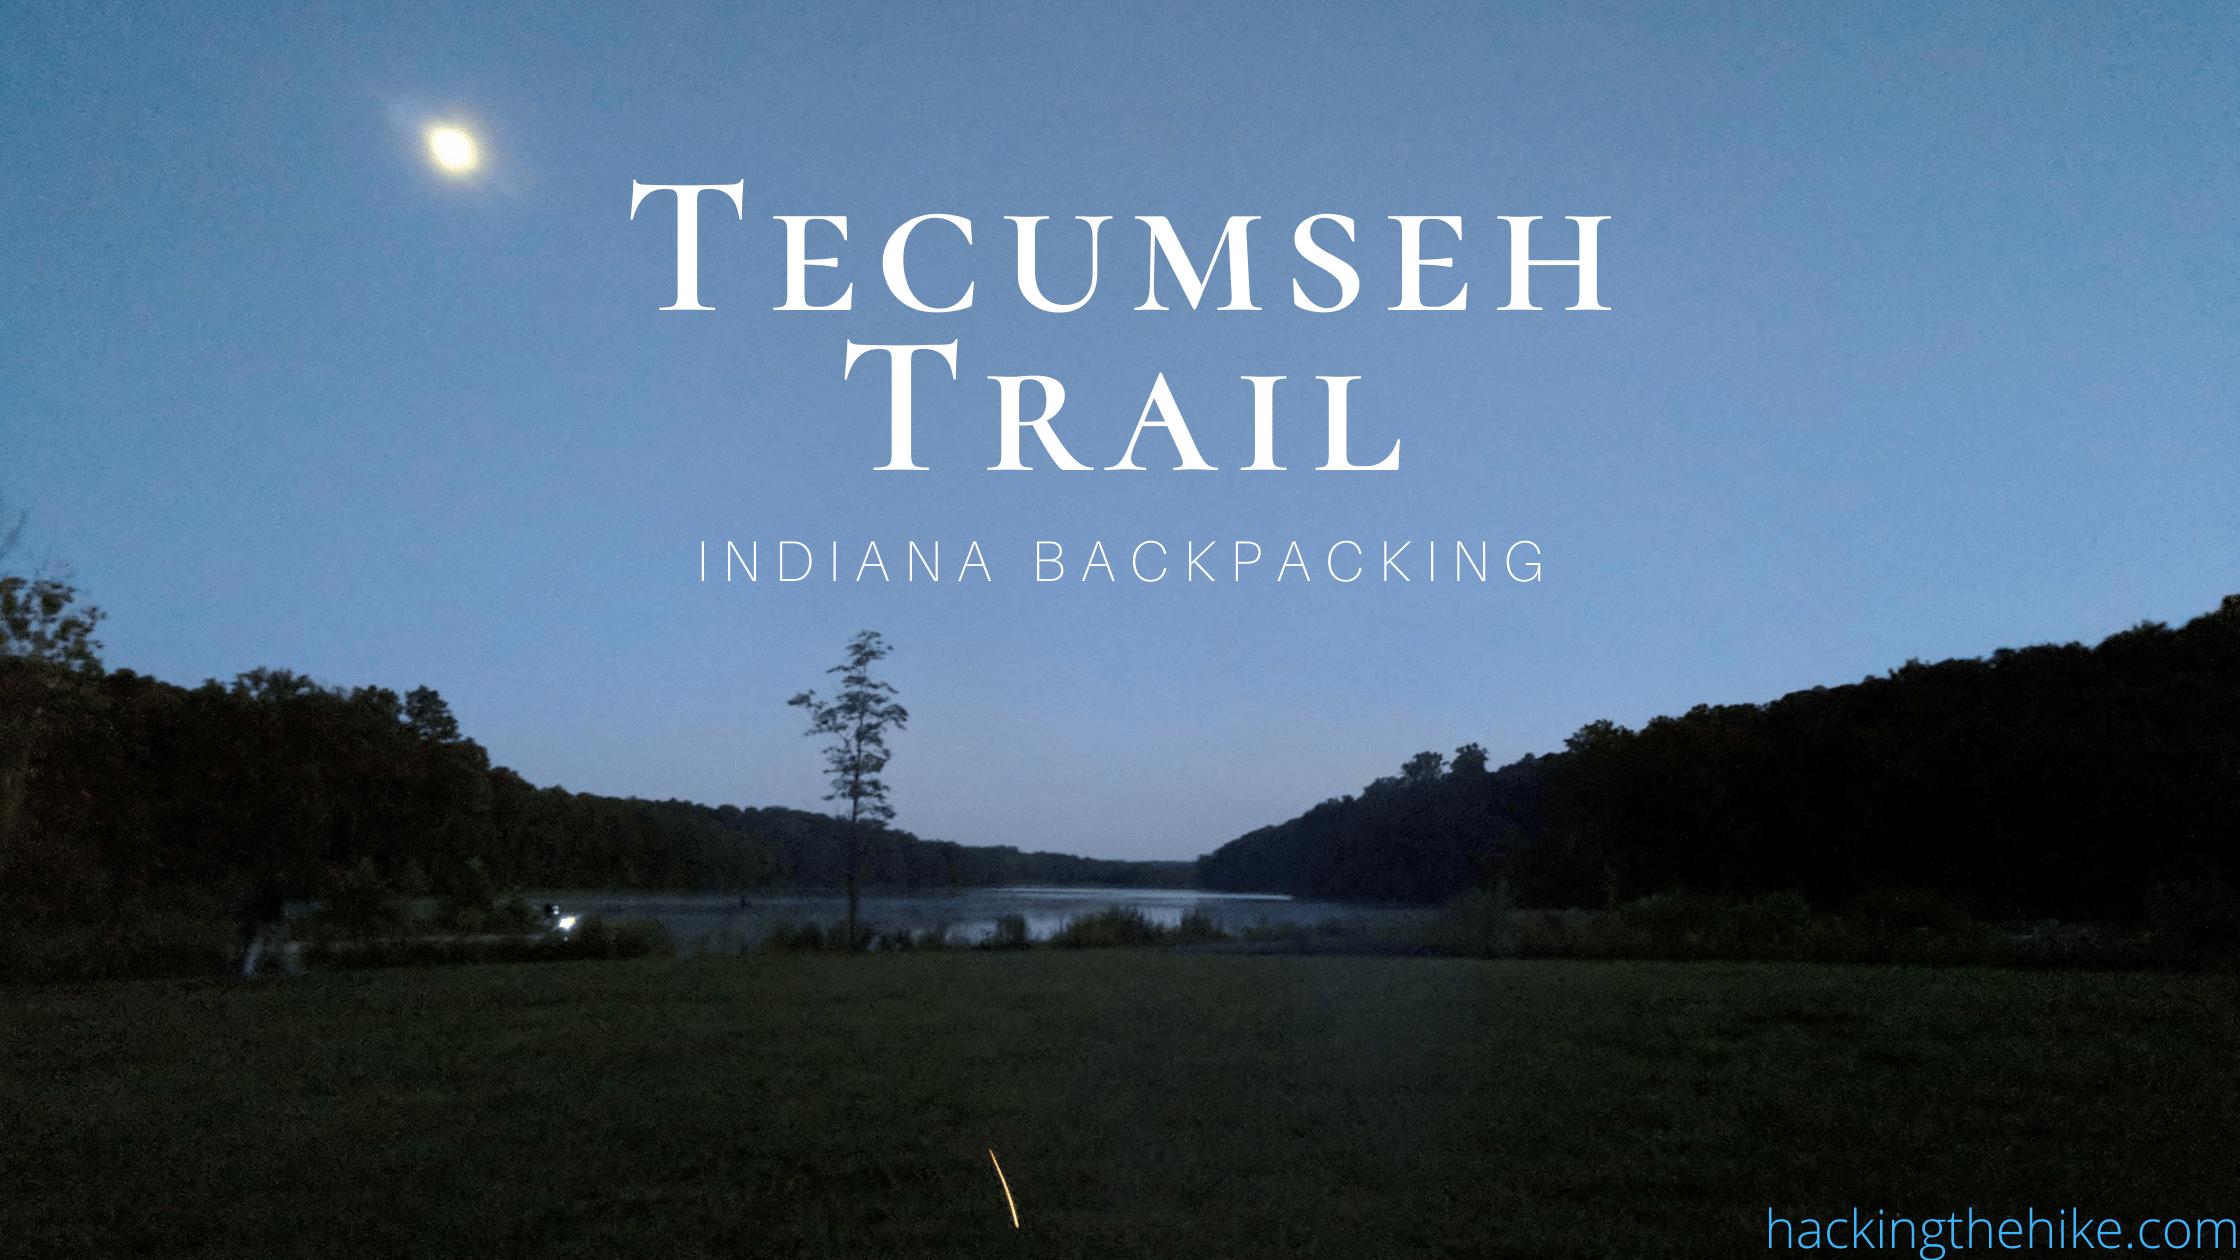 Tecumseh Trail